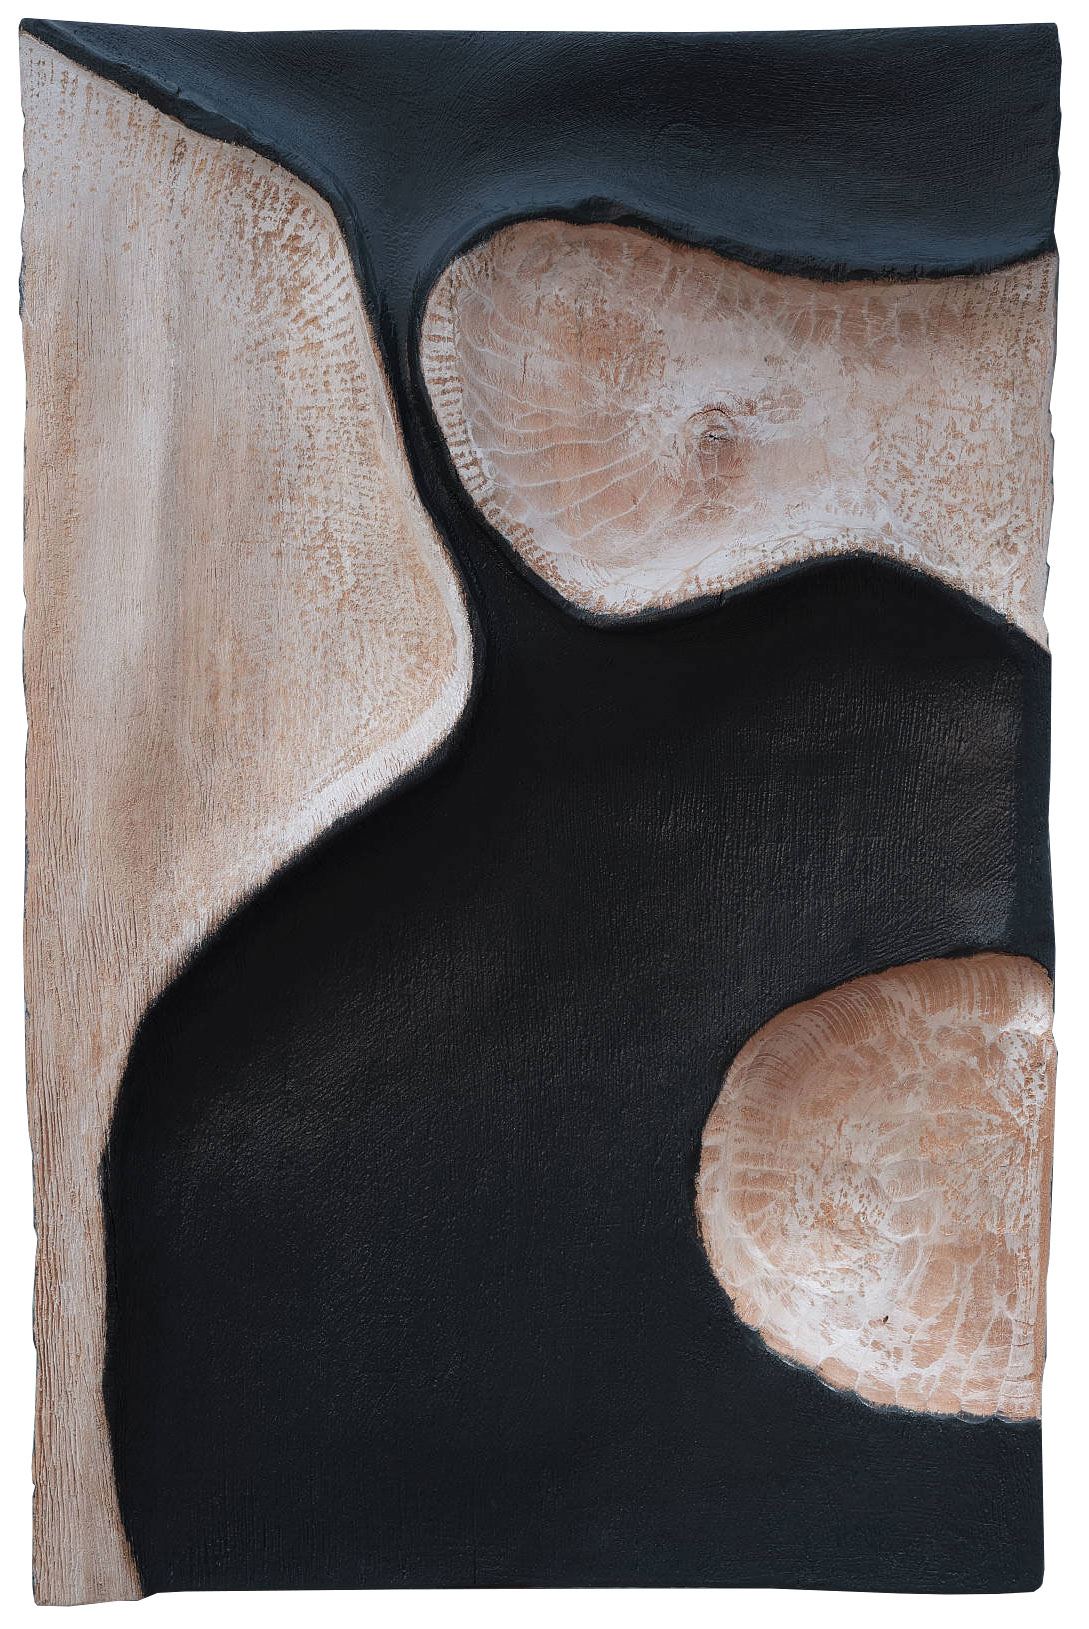 "Wandskulptur ""#0621"" (2021) (Original / Unikat), Holz"